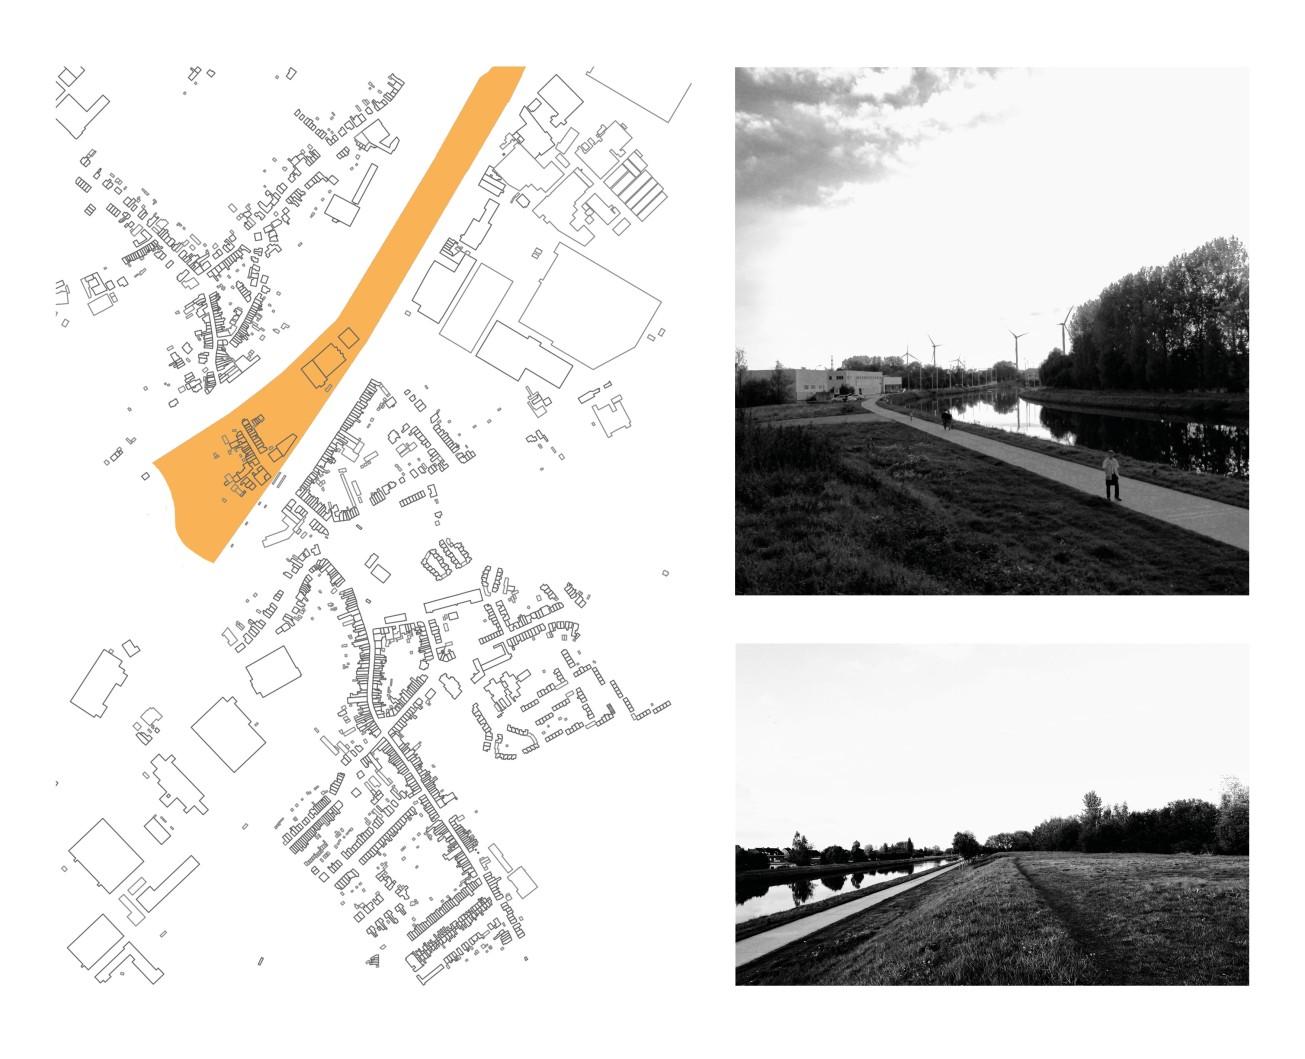 Atlas of Unexpected Spaces for Collectivity_Tomasz Bulczak_1st year_KU Leuven_19